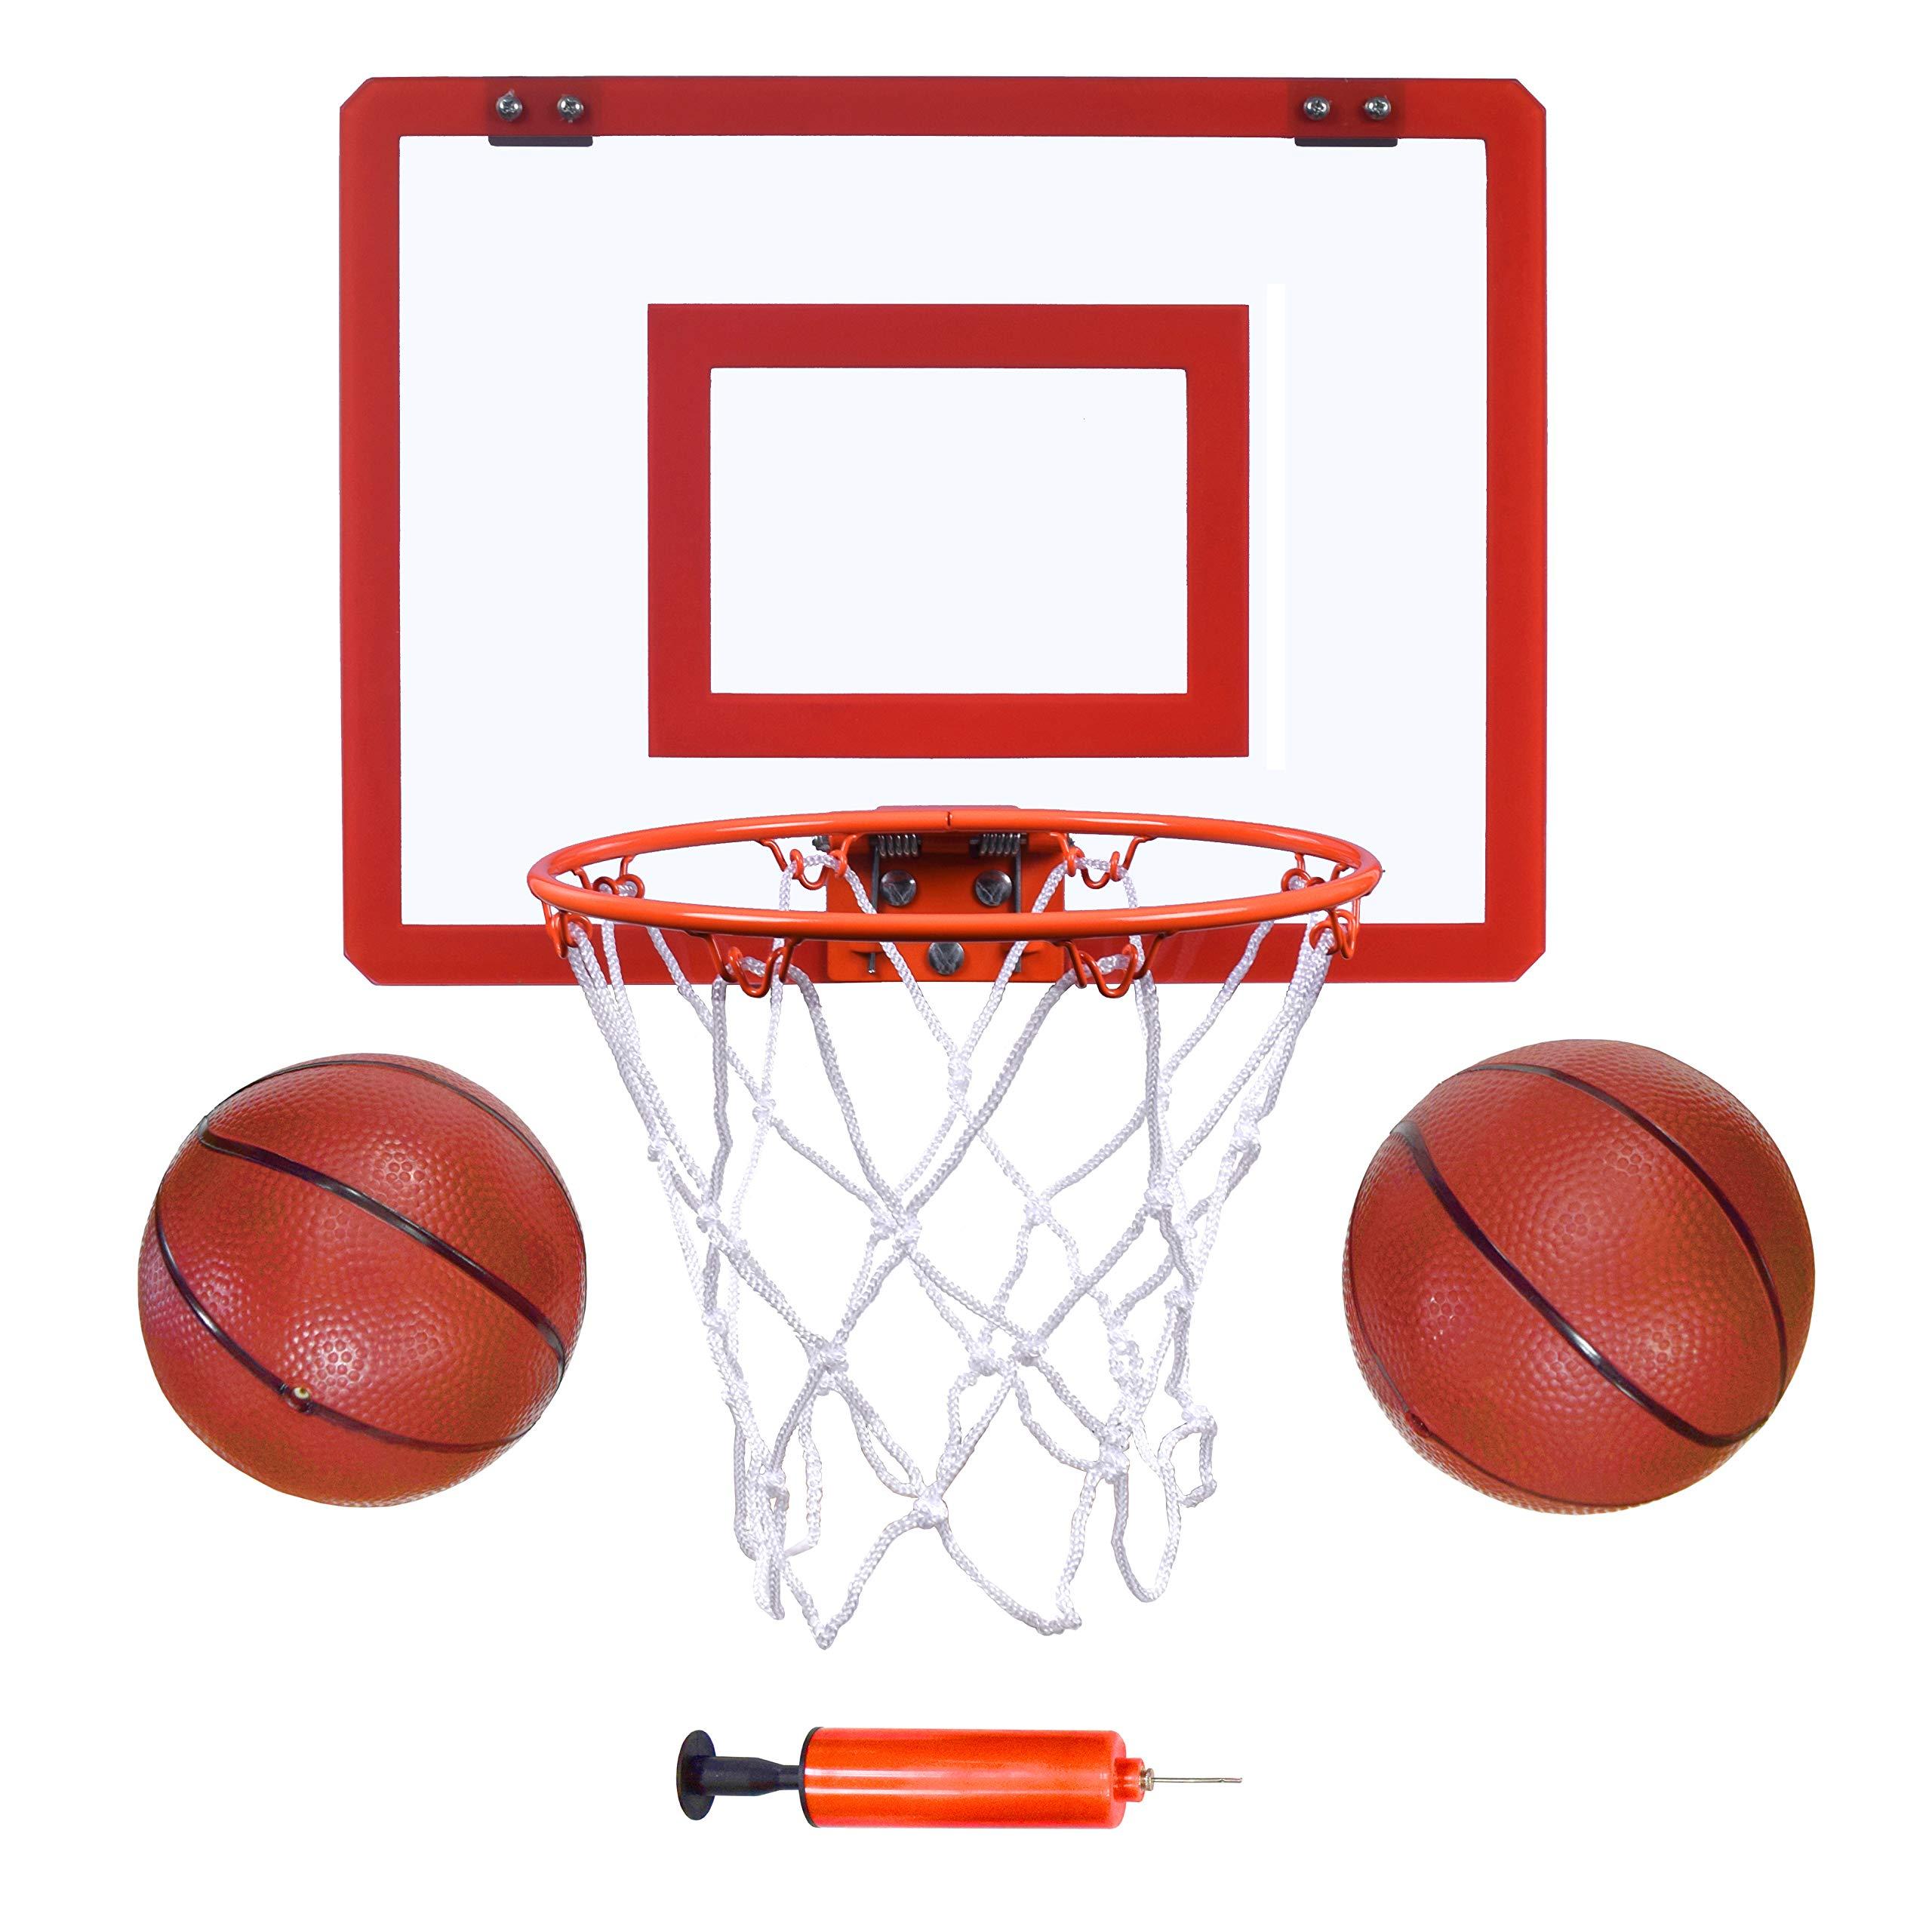 Indoor Mini Basketball Hoop and Balls 16''x12 - Basketball Hoop for Door Set - Indoor Mini Basketball Game for Kids